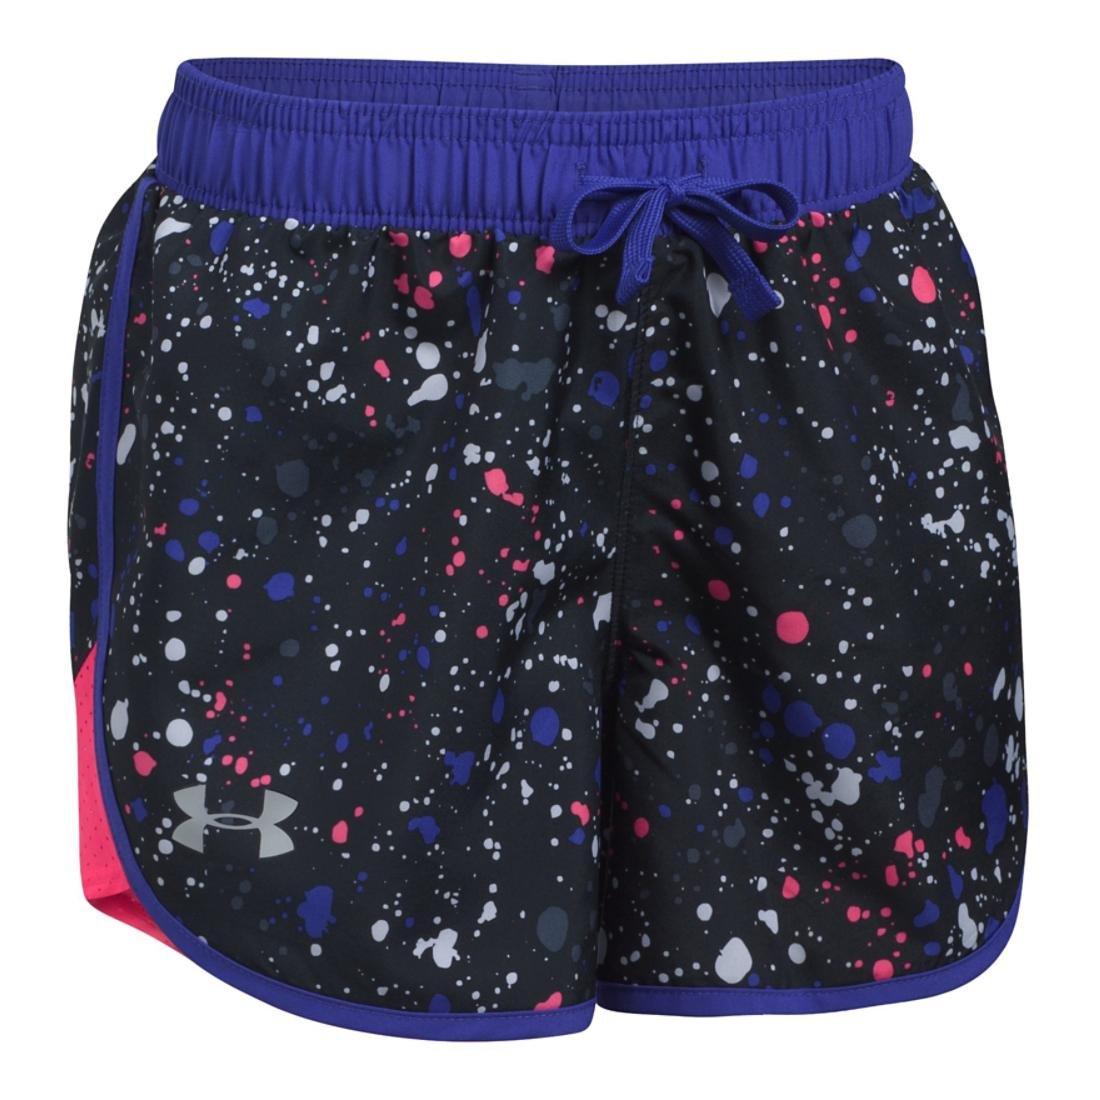 Under Armour Girls Fast Lane Novelty Short, Black/Pink, XL (18-20 Big Kids) x One Size